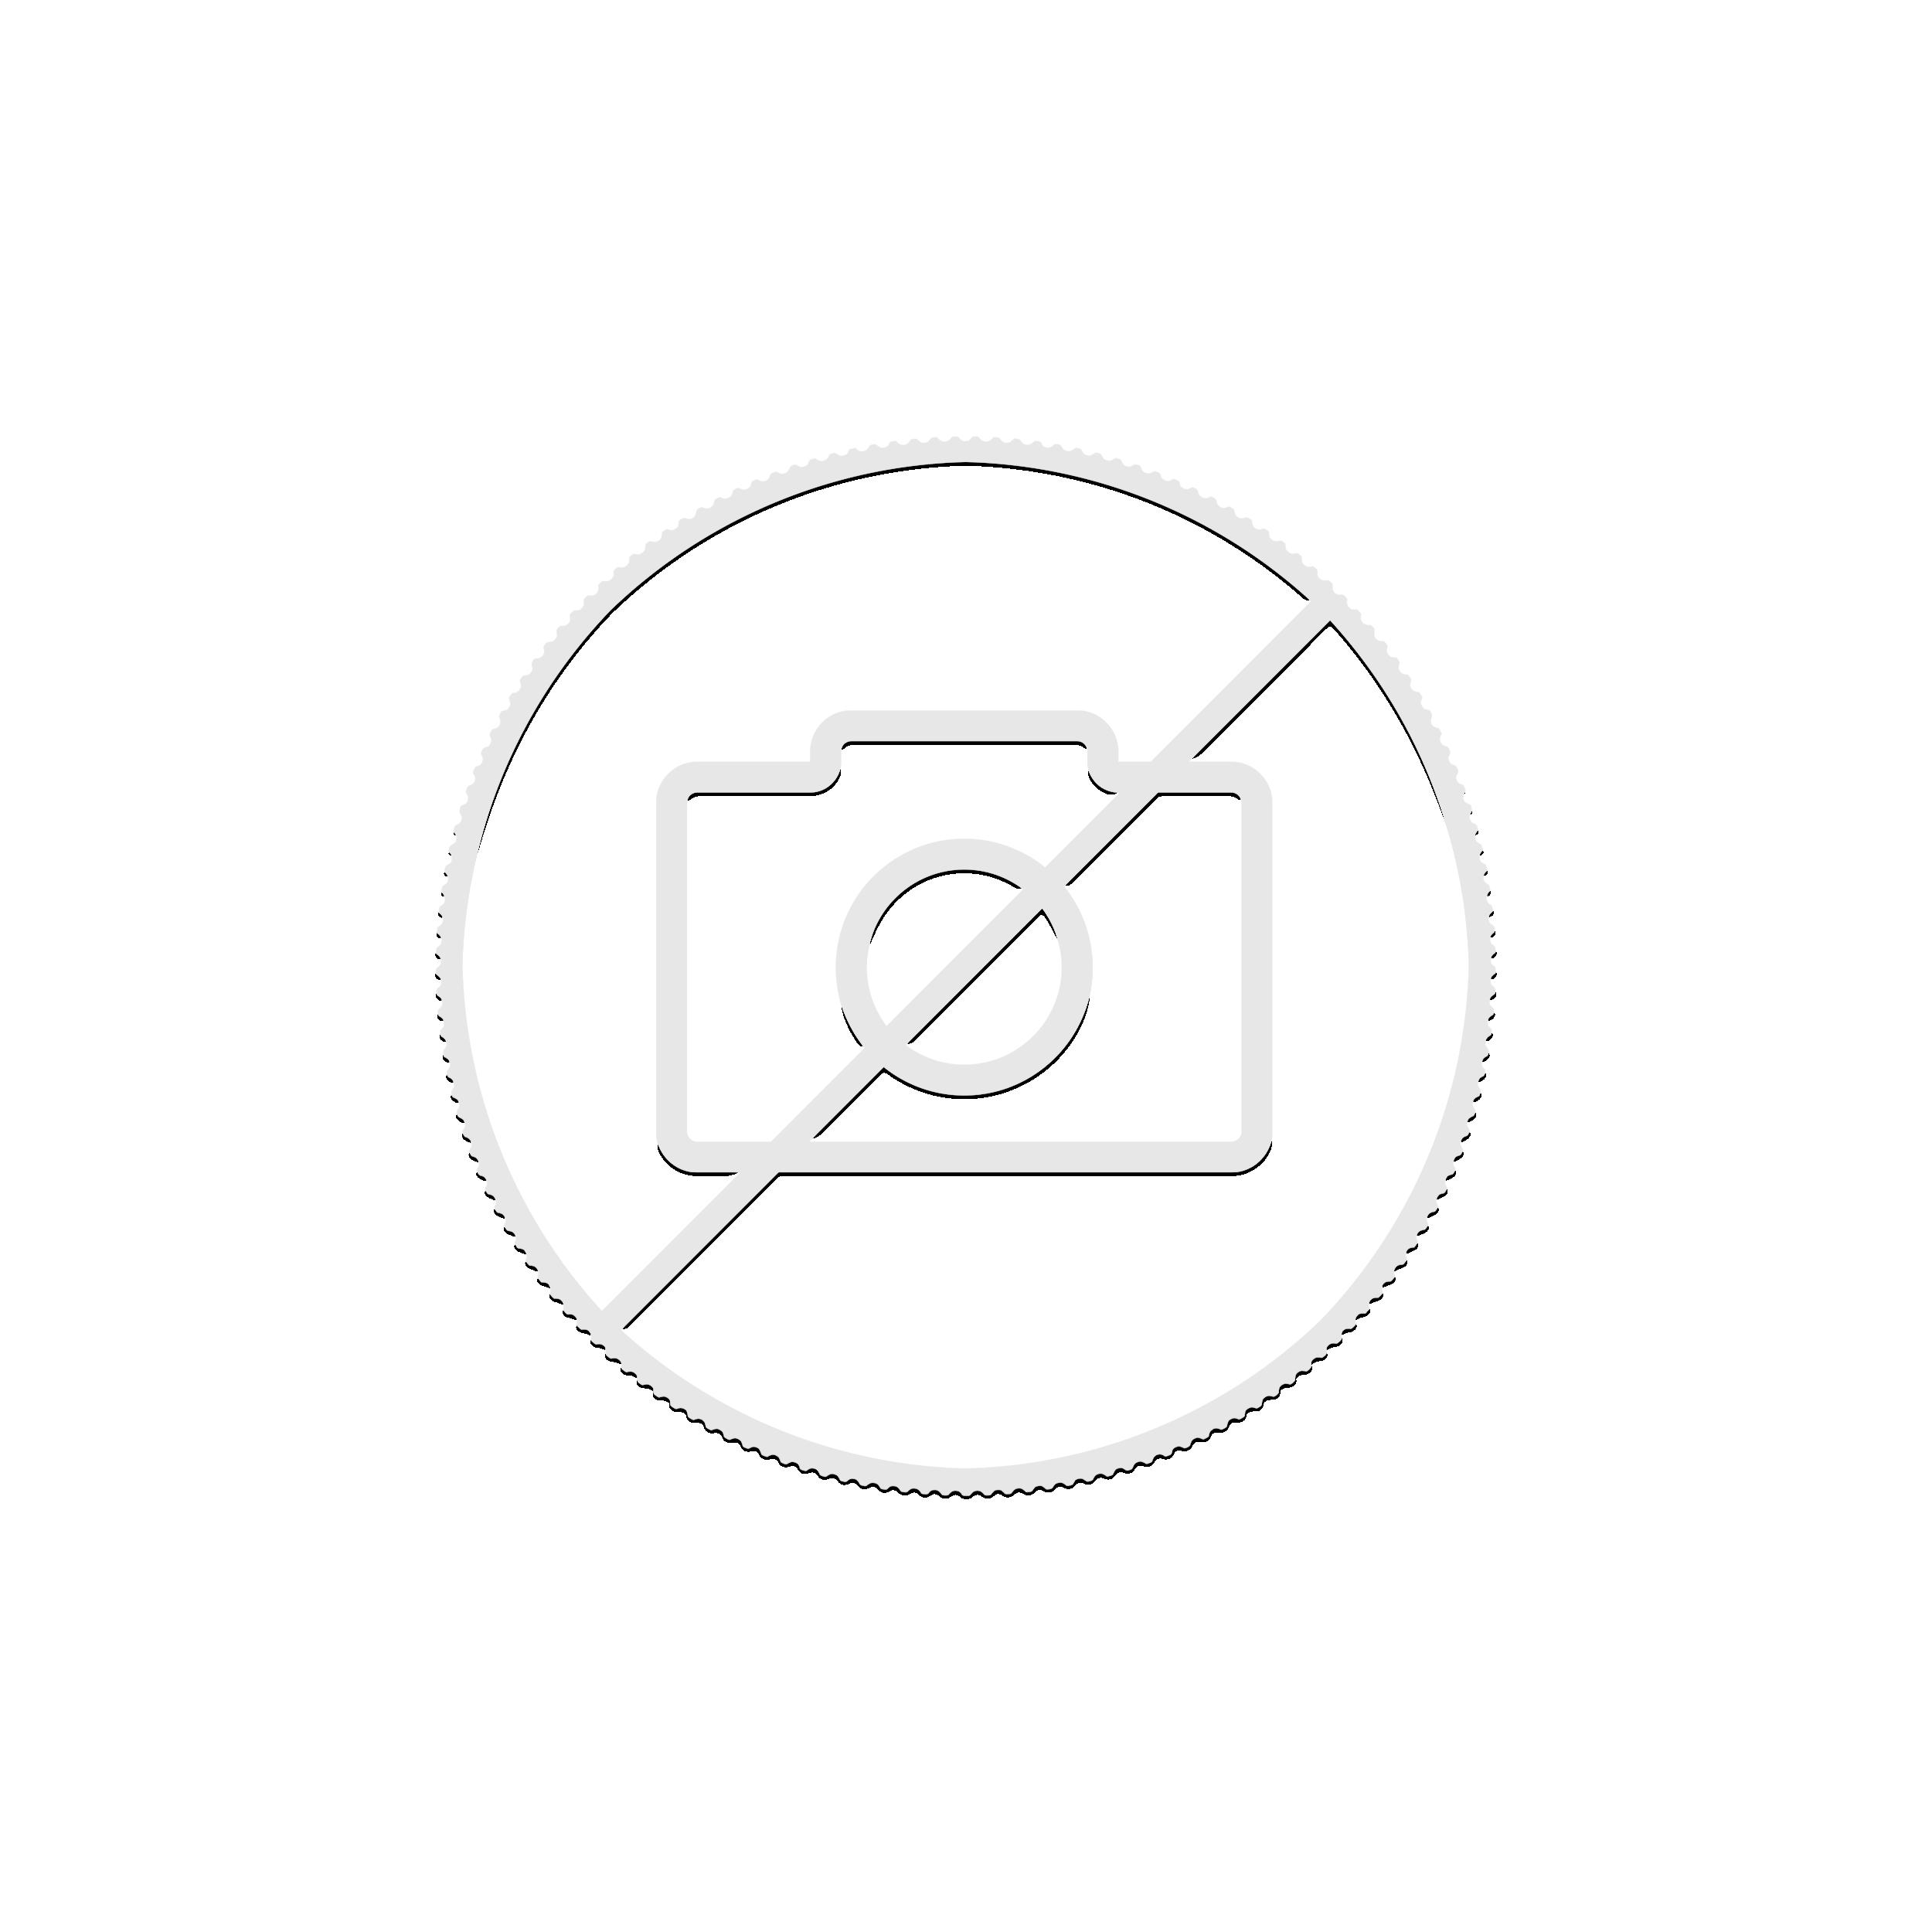 1 troy ounce zilveren Britannia 2020 munt